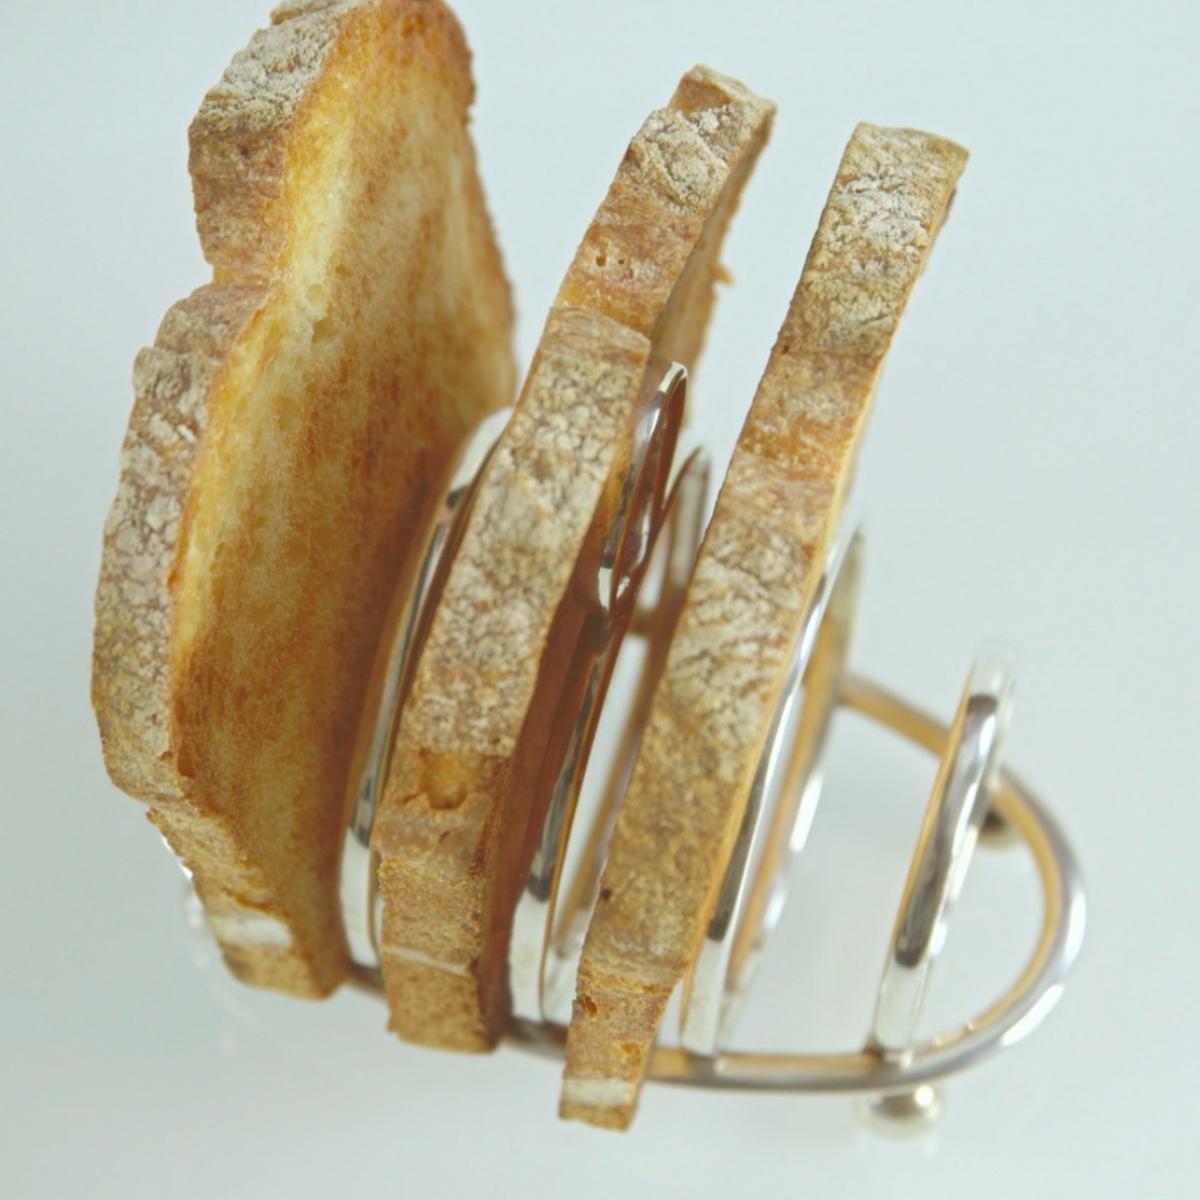 Cs perfect toast